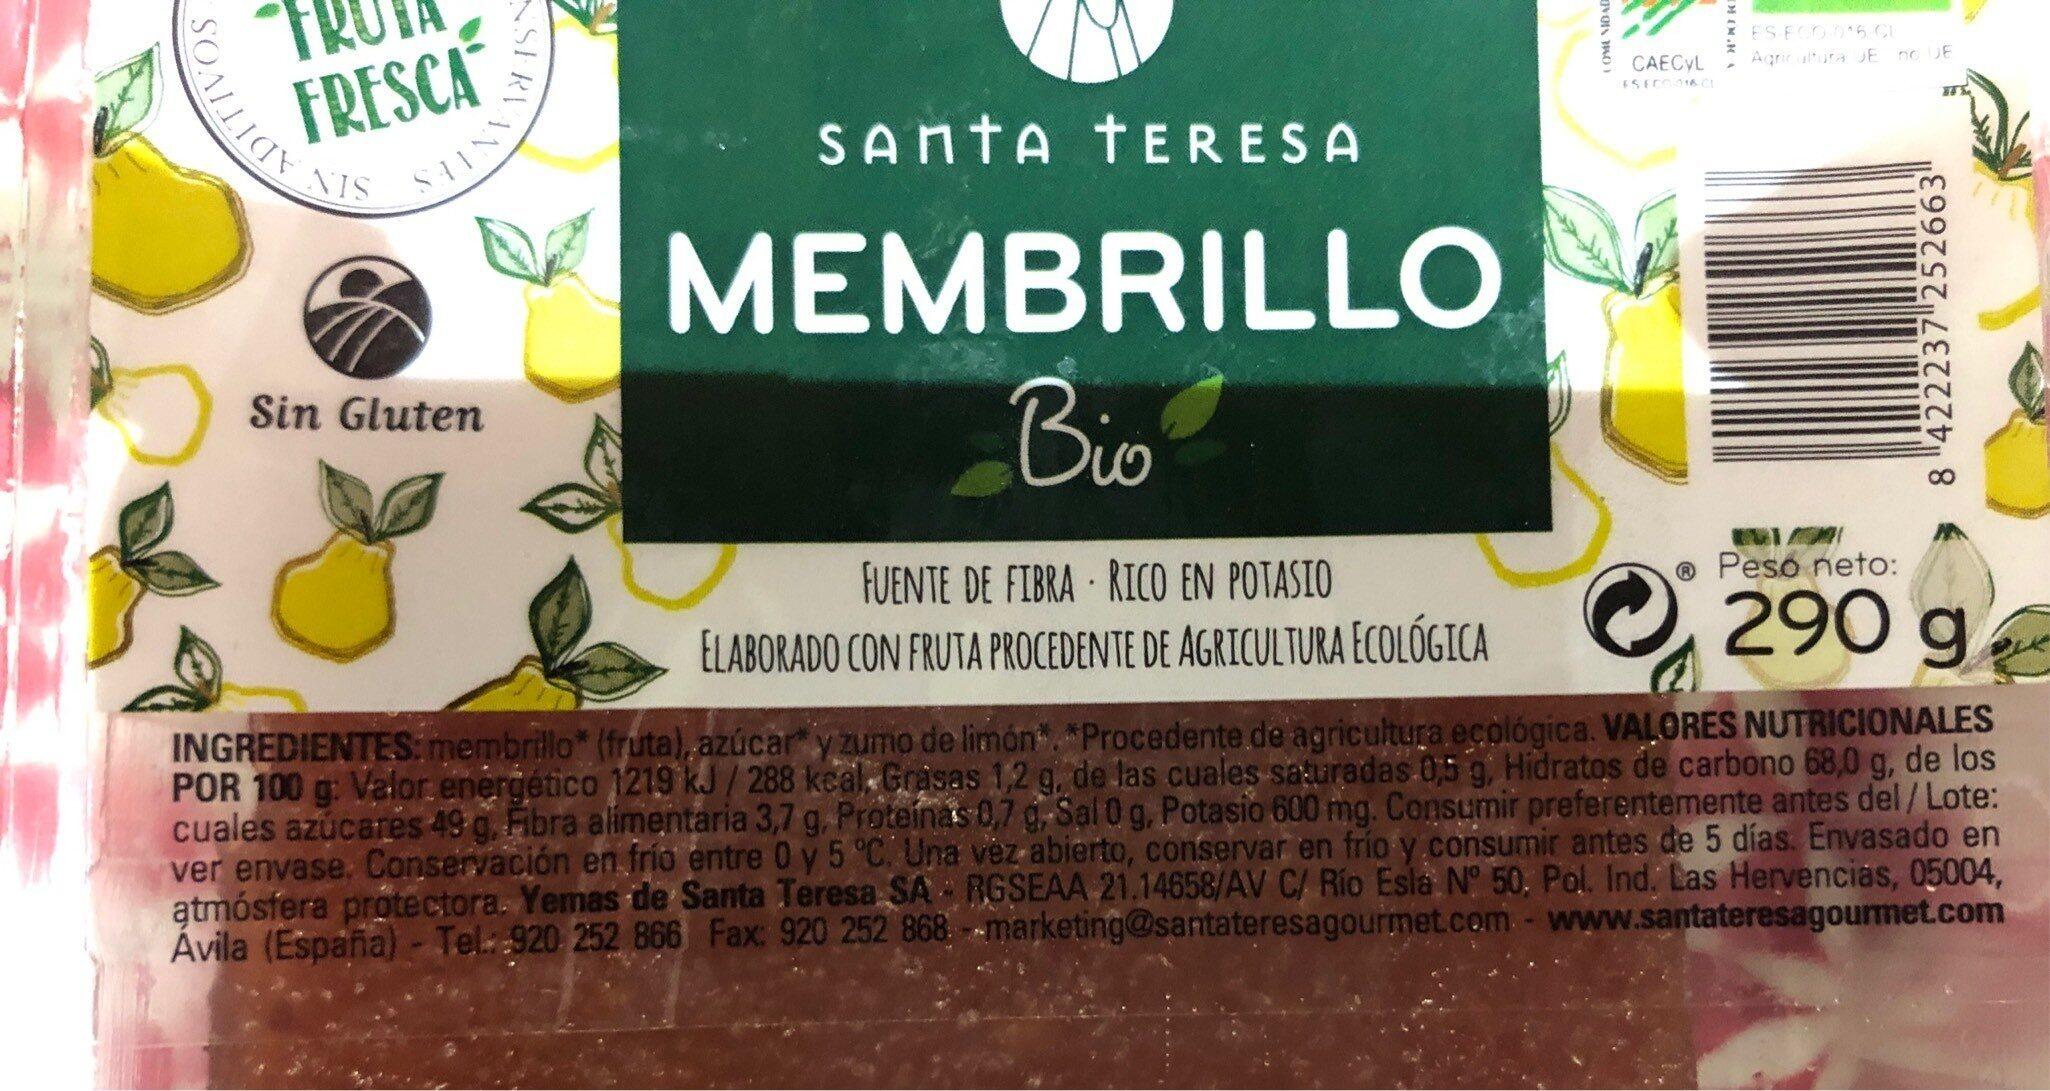 Membrillo sin gluten ecológico envase 290 g - Información nutricional